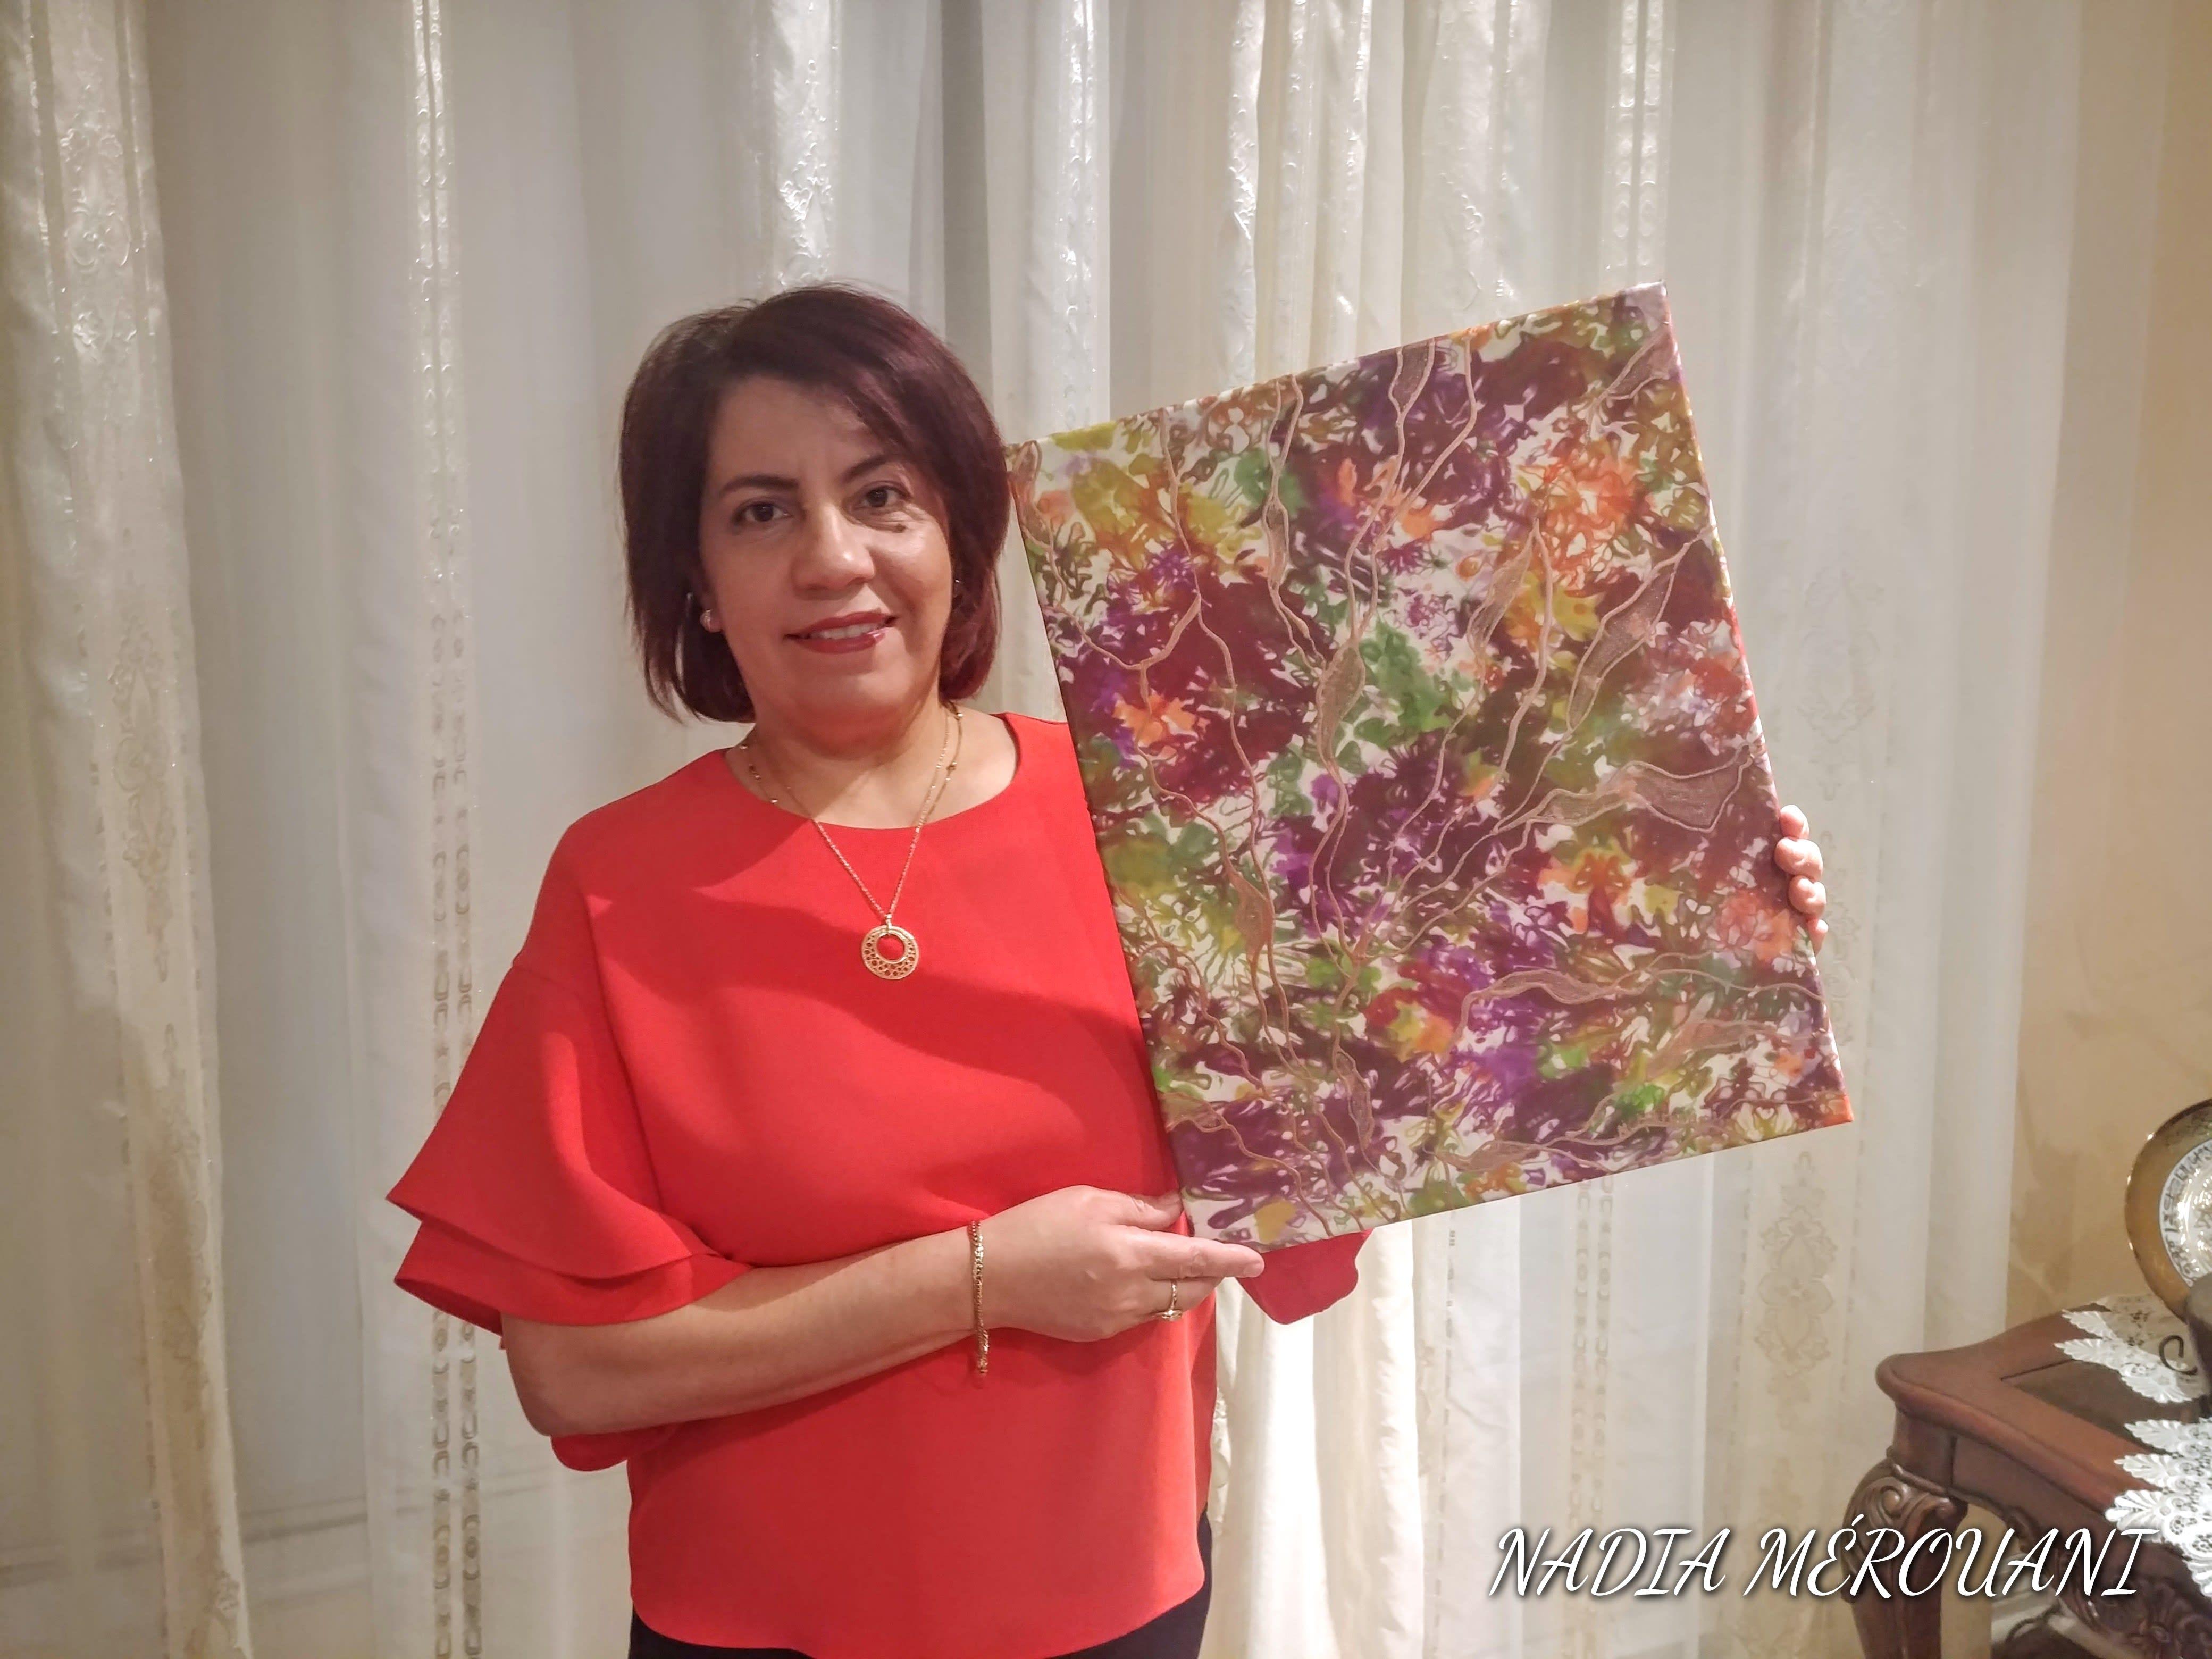 Nadia Merouani